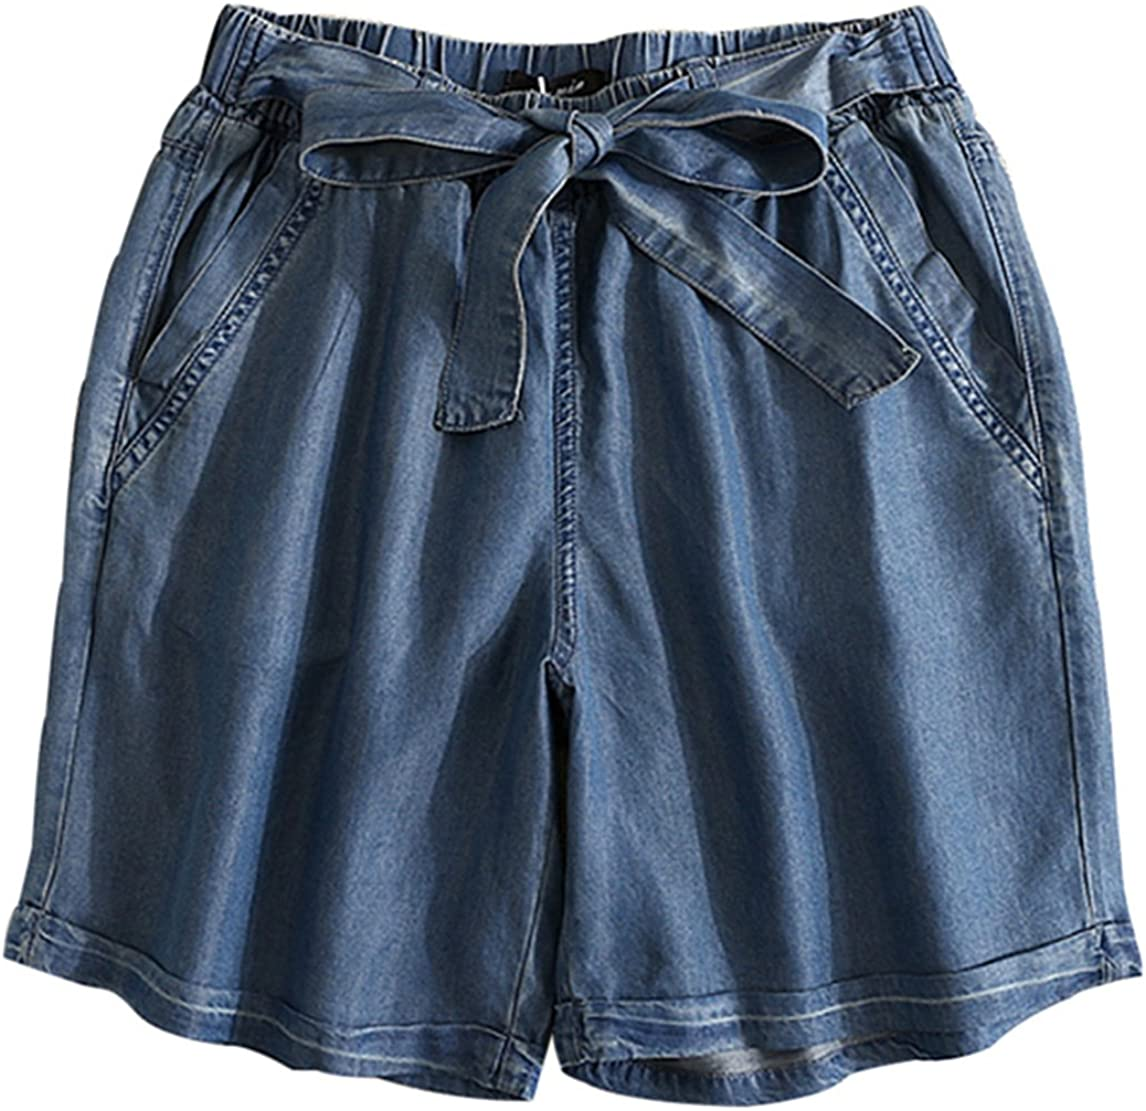 Yimoon Women's Elastic Waist Casual Comfy Tencel Denim Shorts with Drawstring